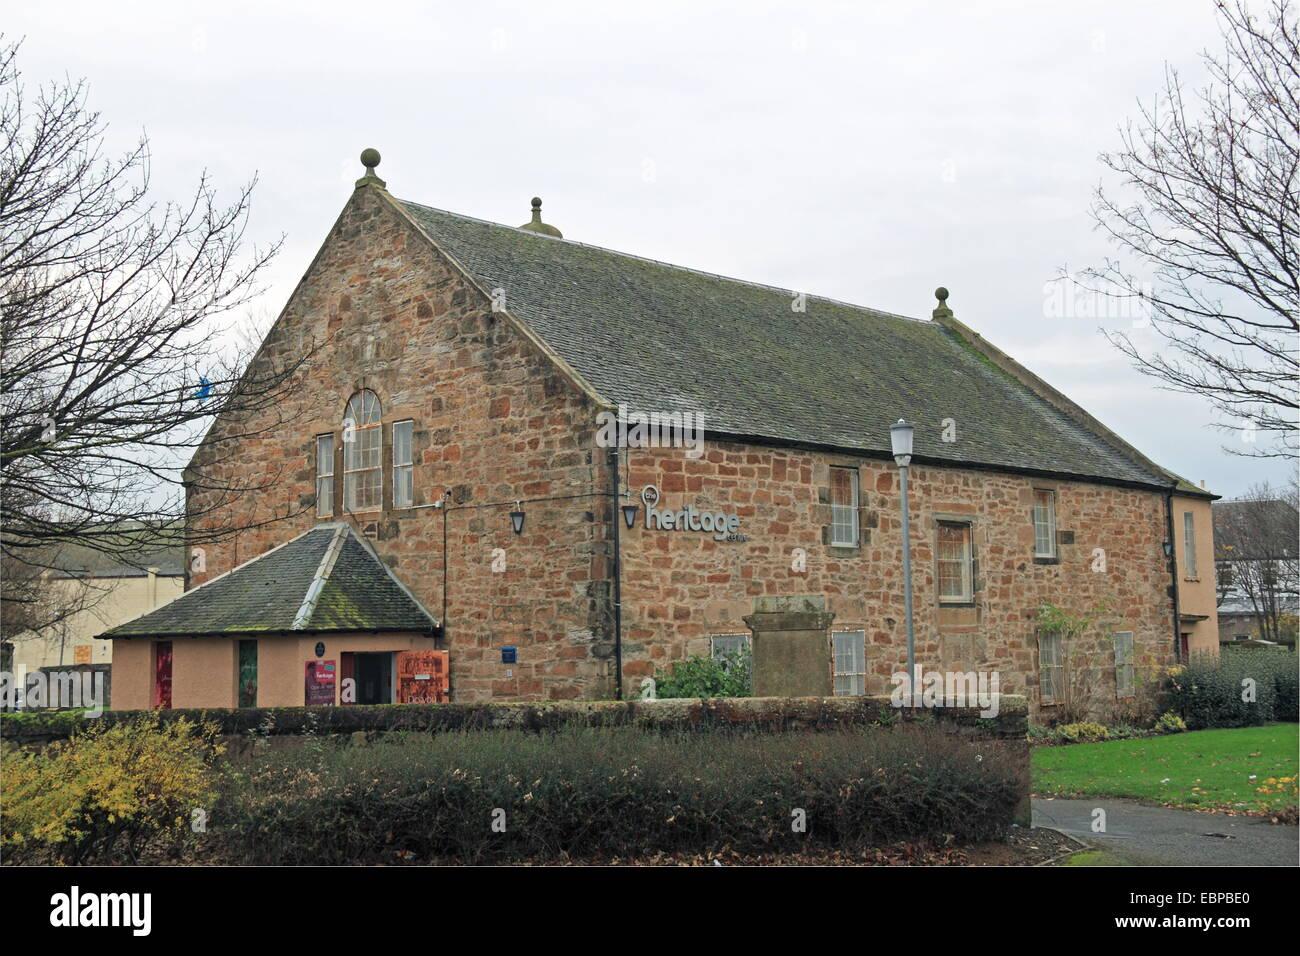 North Ayrshire Heritage Centre, Saltcoats, North Ayrshire, County of Ayr, Scotland, Great Britain, United Kingdom, - Stock Image